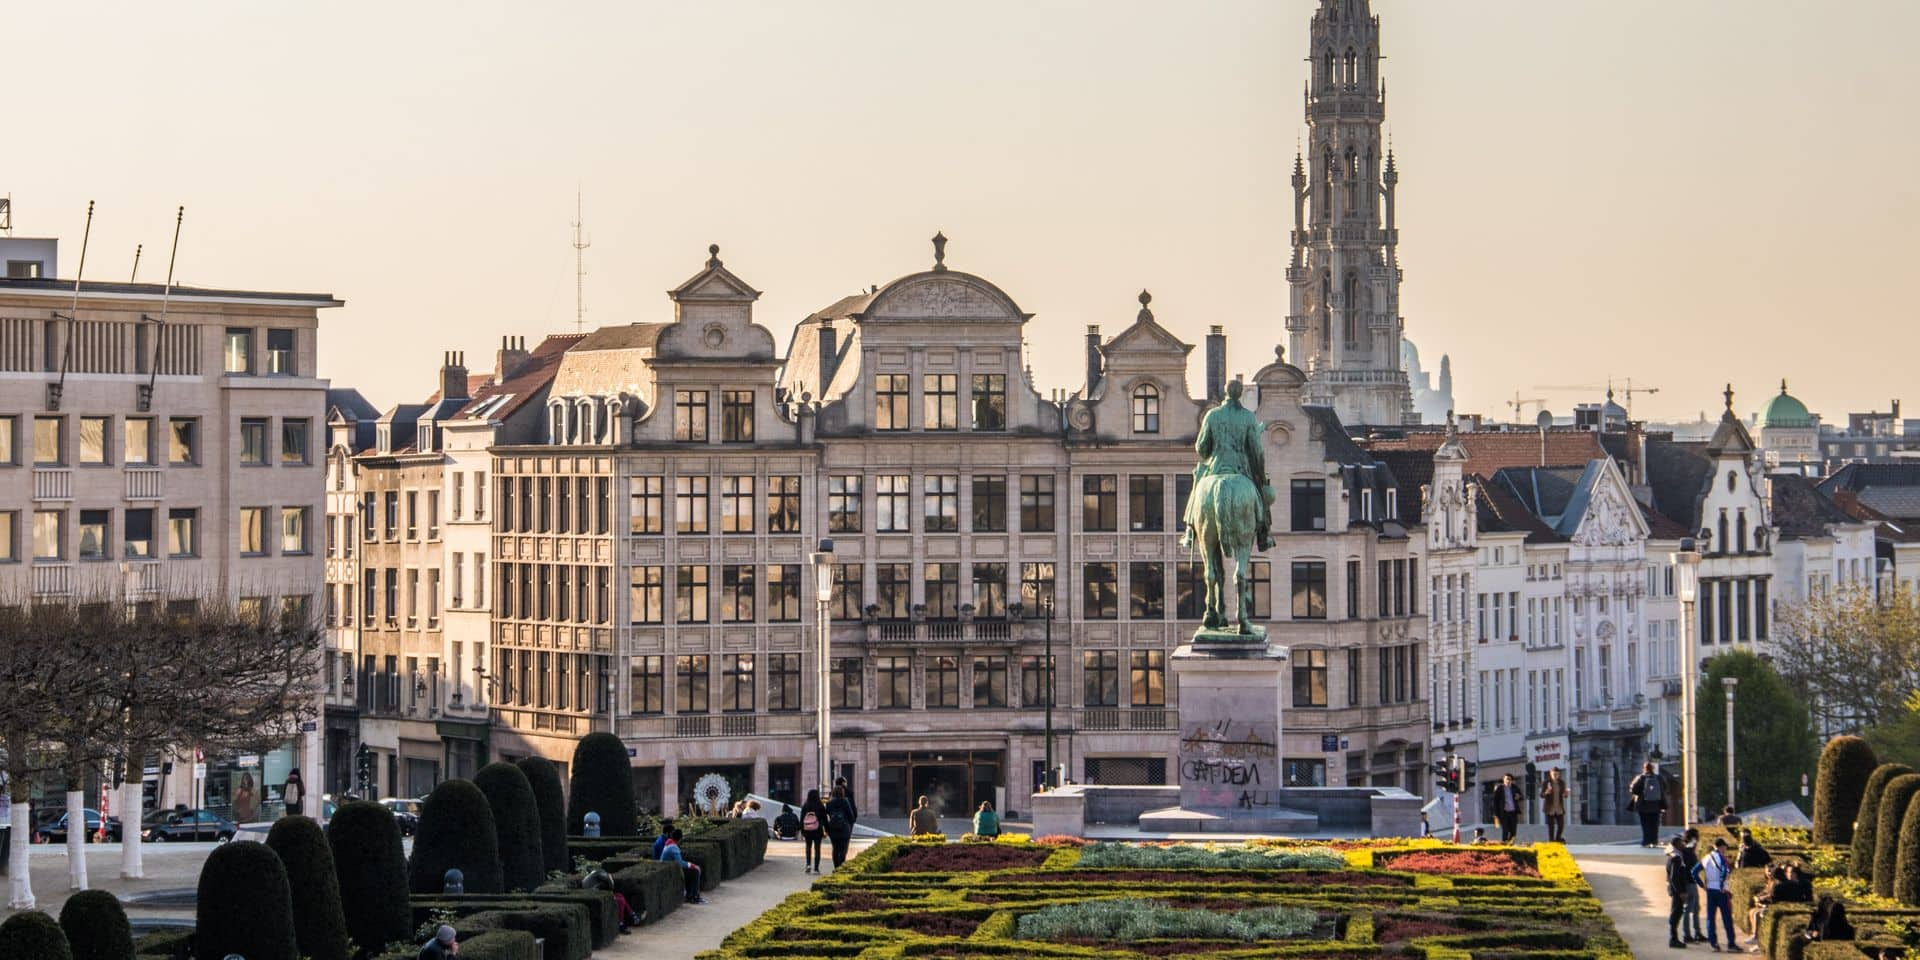 Bruxelles capitale culturelle 2030 ? Un vrai défi